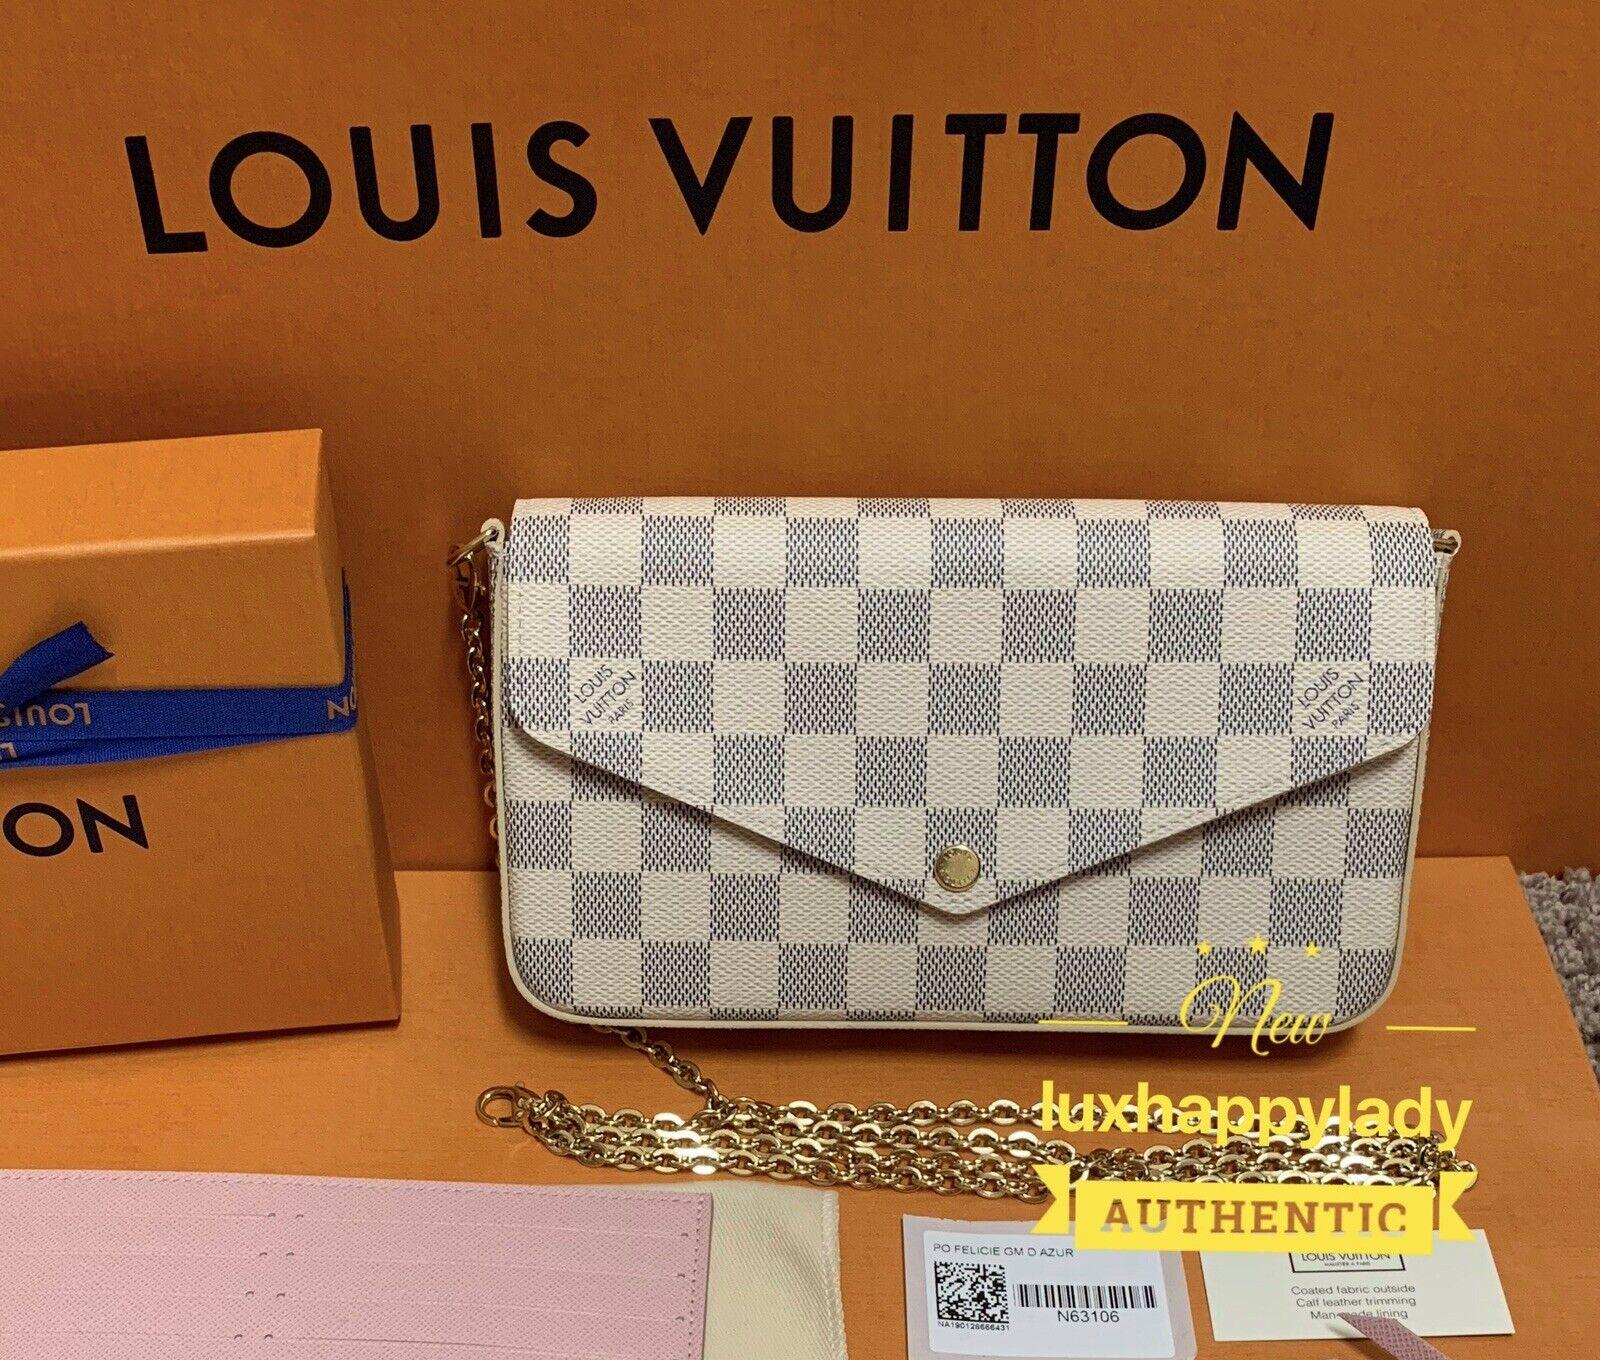 New Louis Vuitton Damier Azur Pochette Felicie Chain Bag Italy 2020 Gift Set